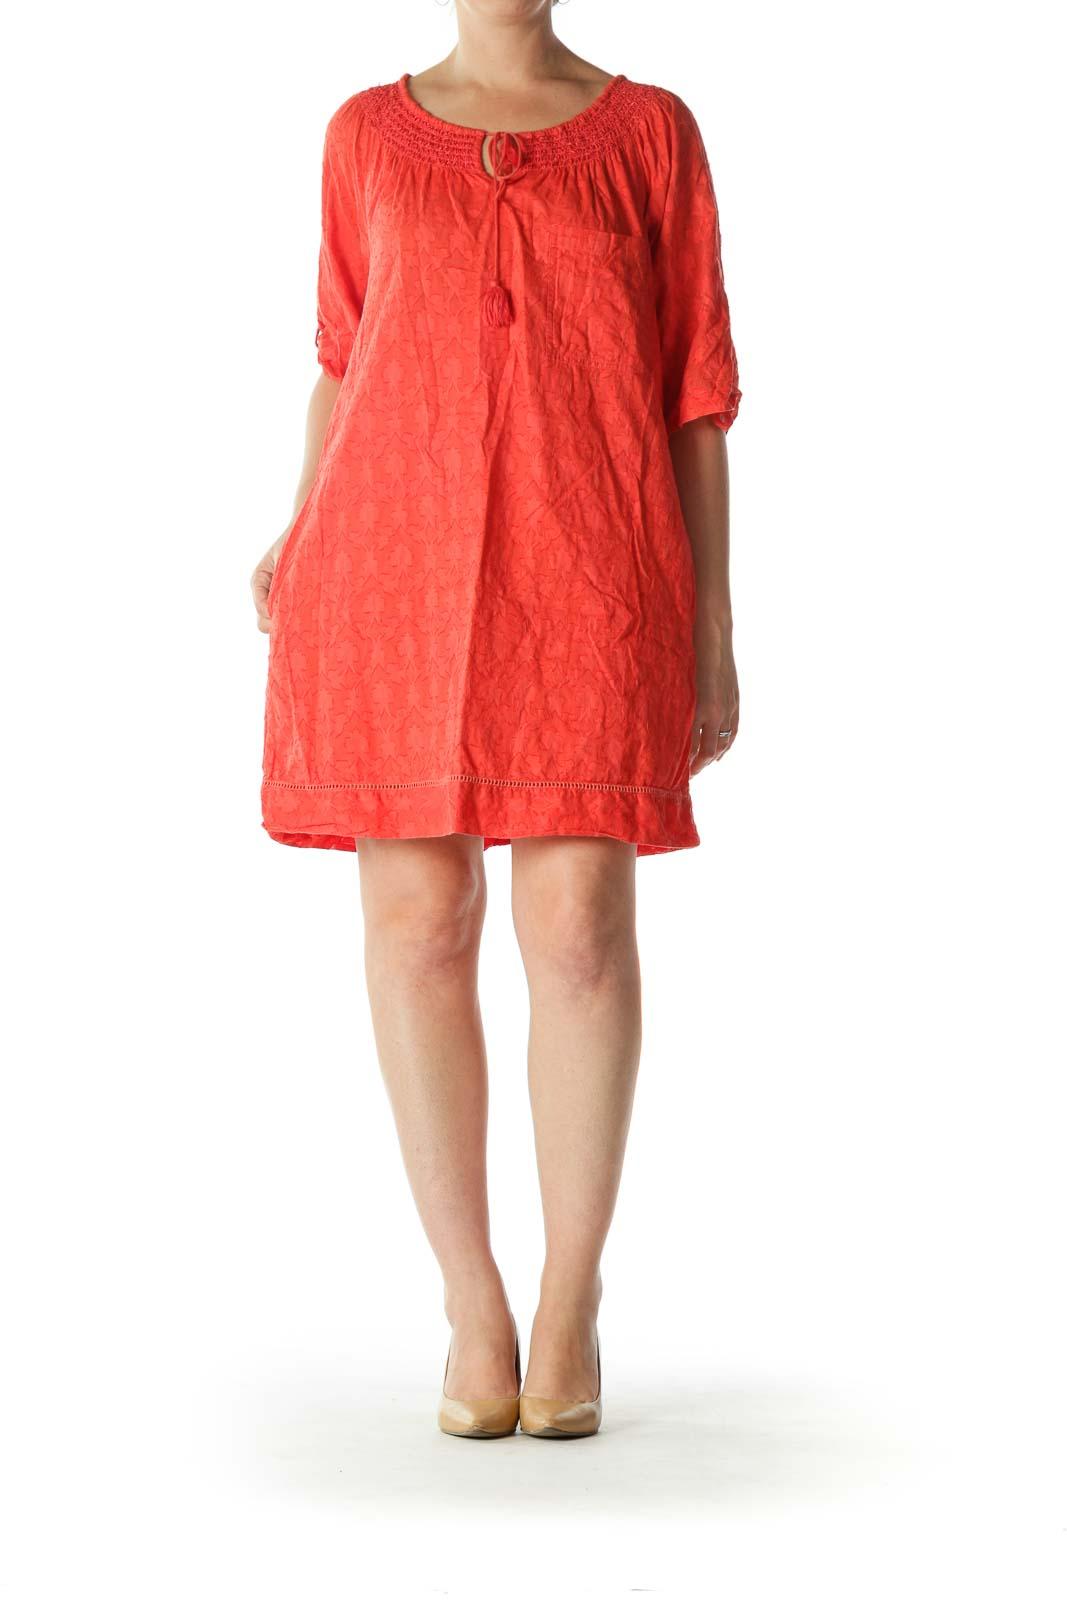 Coral-Orange 100% Cotton Pocketed Textured Dress